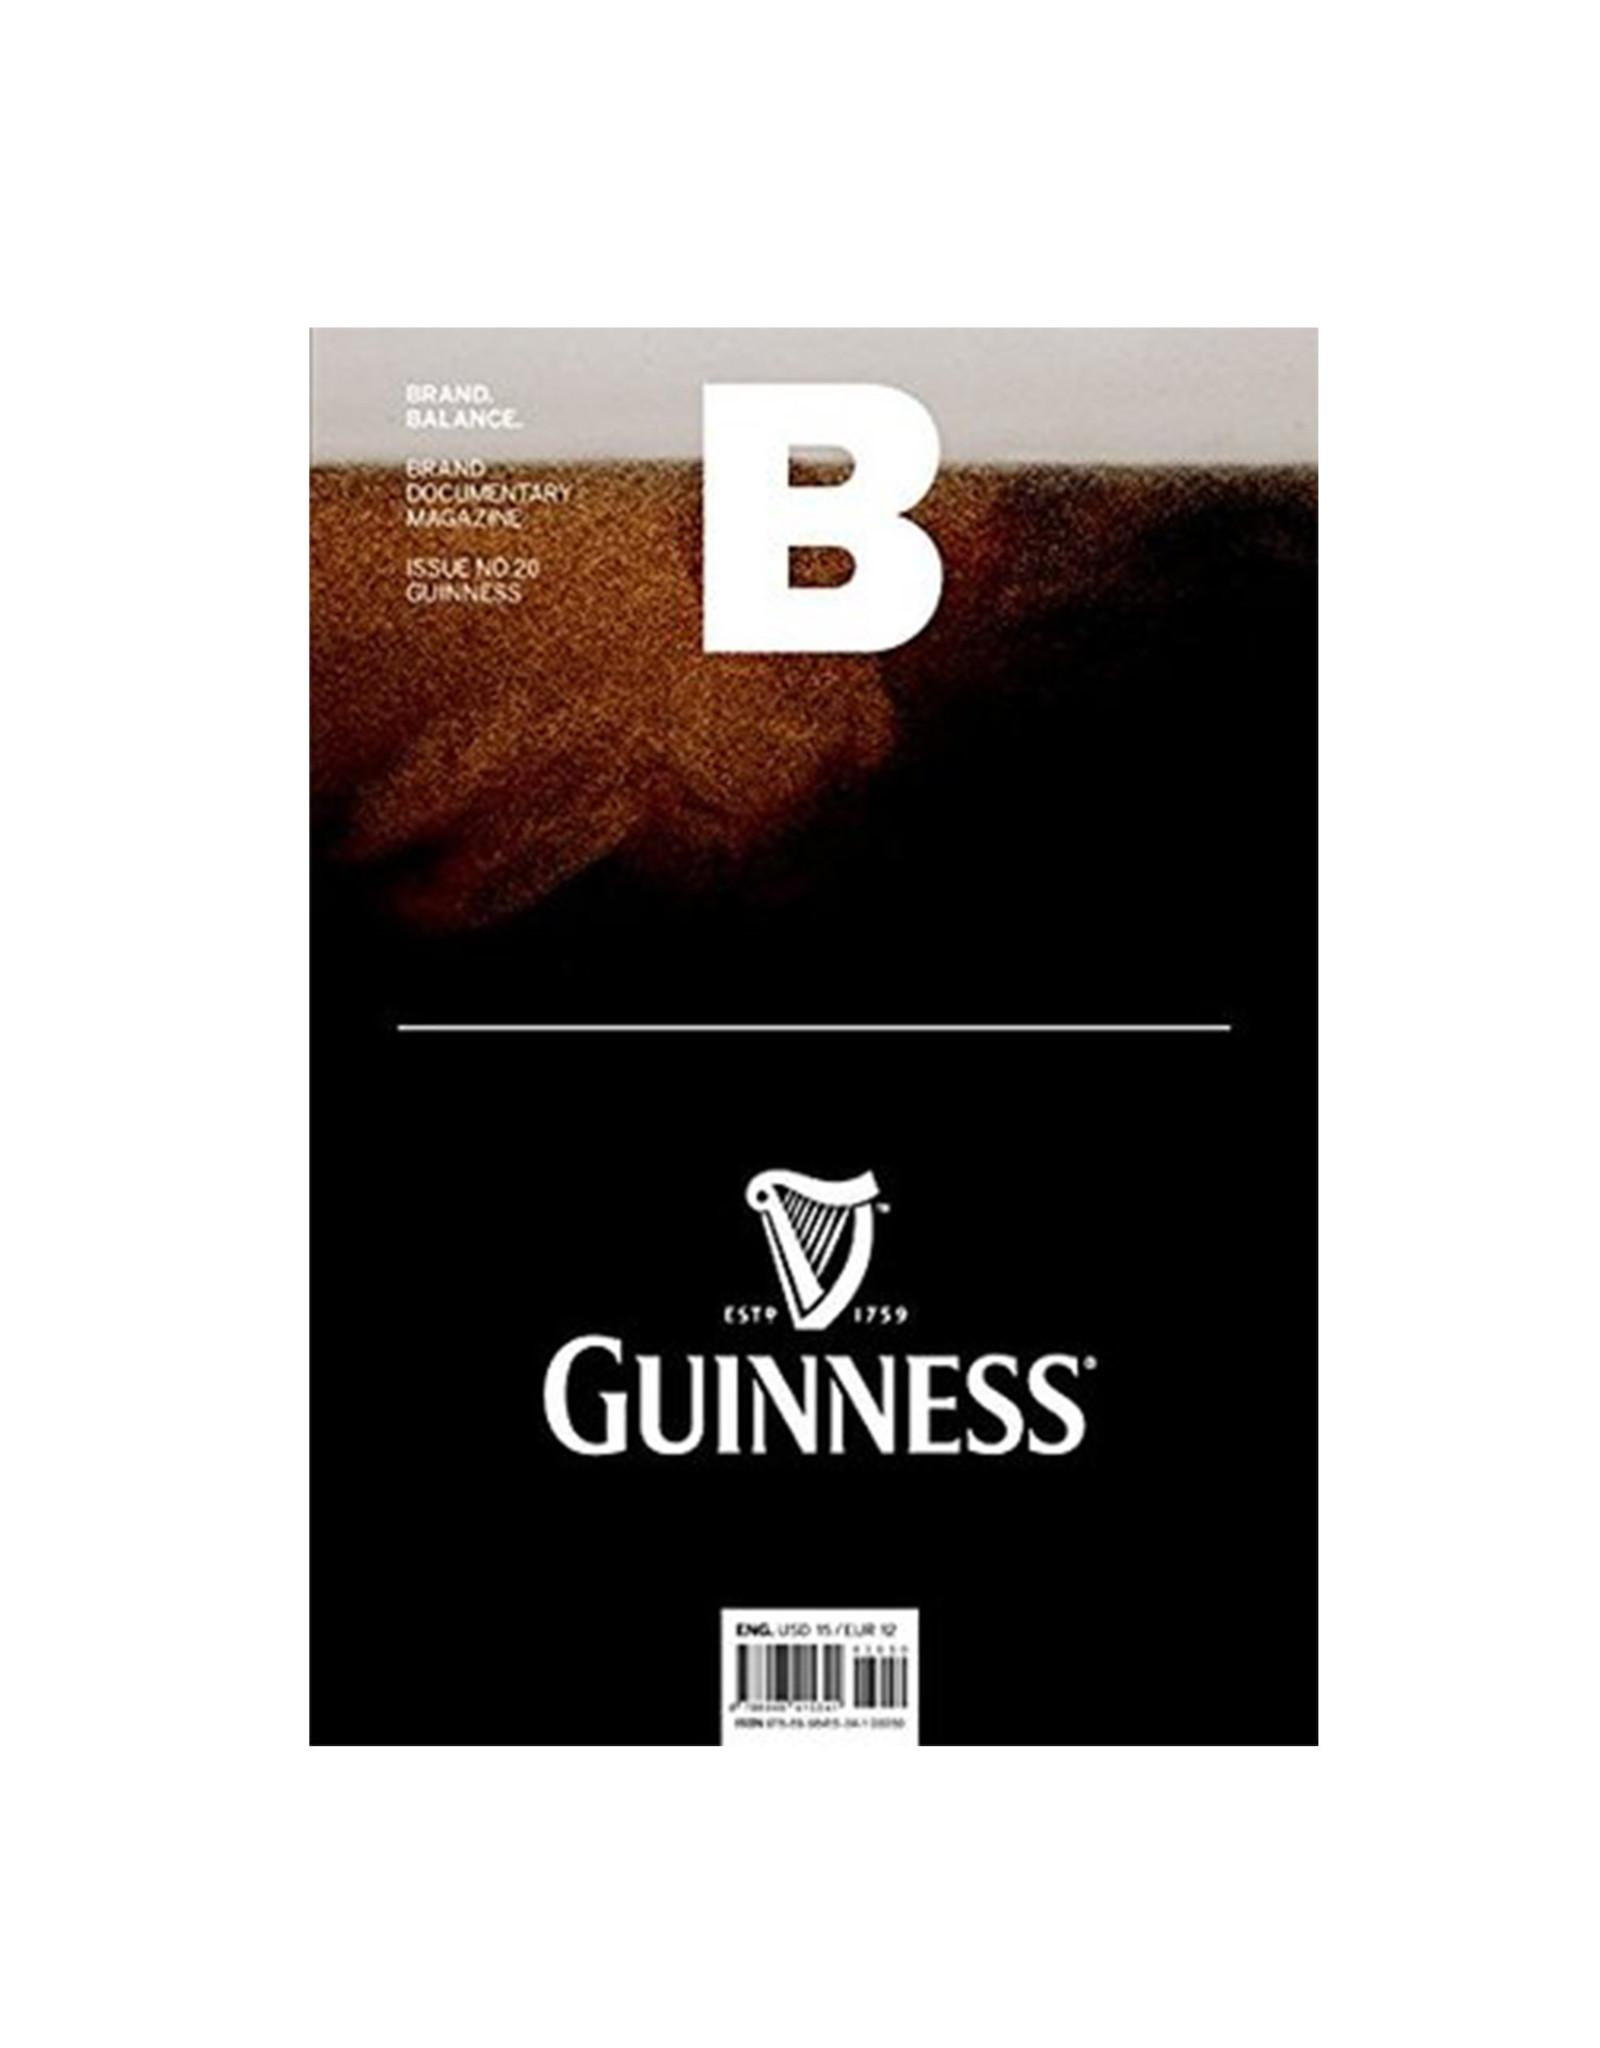 Magazine B, Issue 20 Guinness